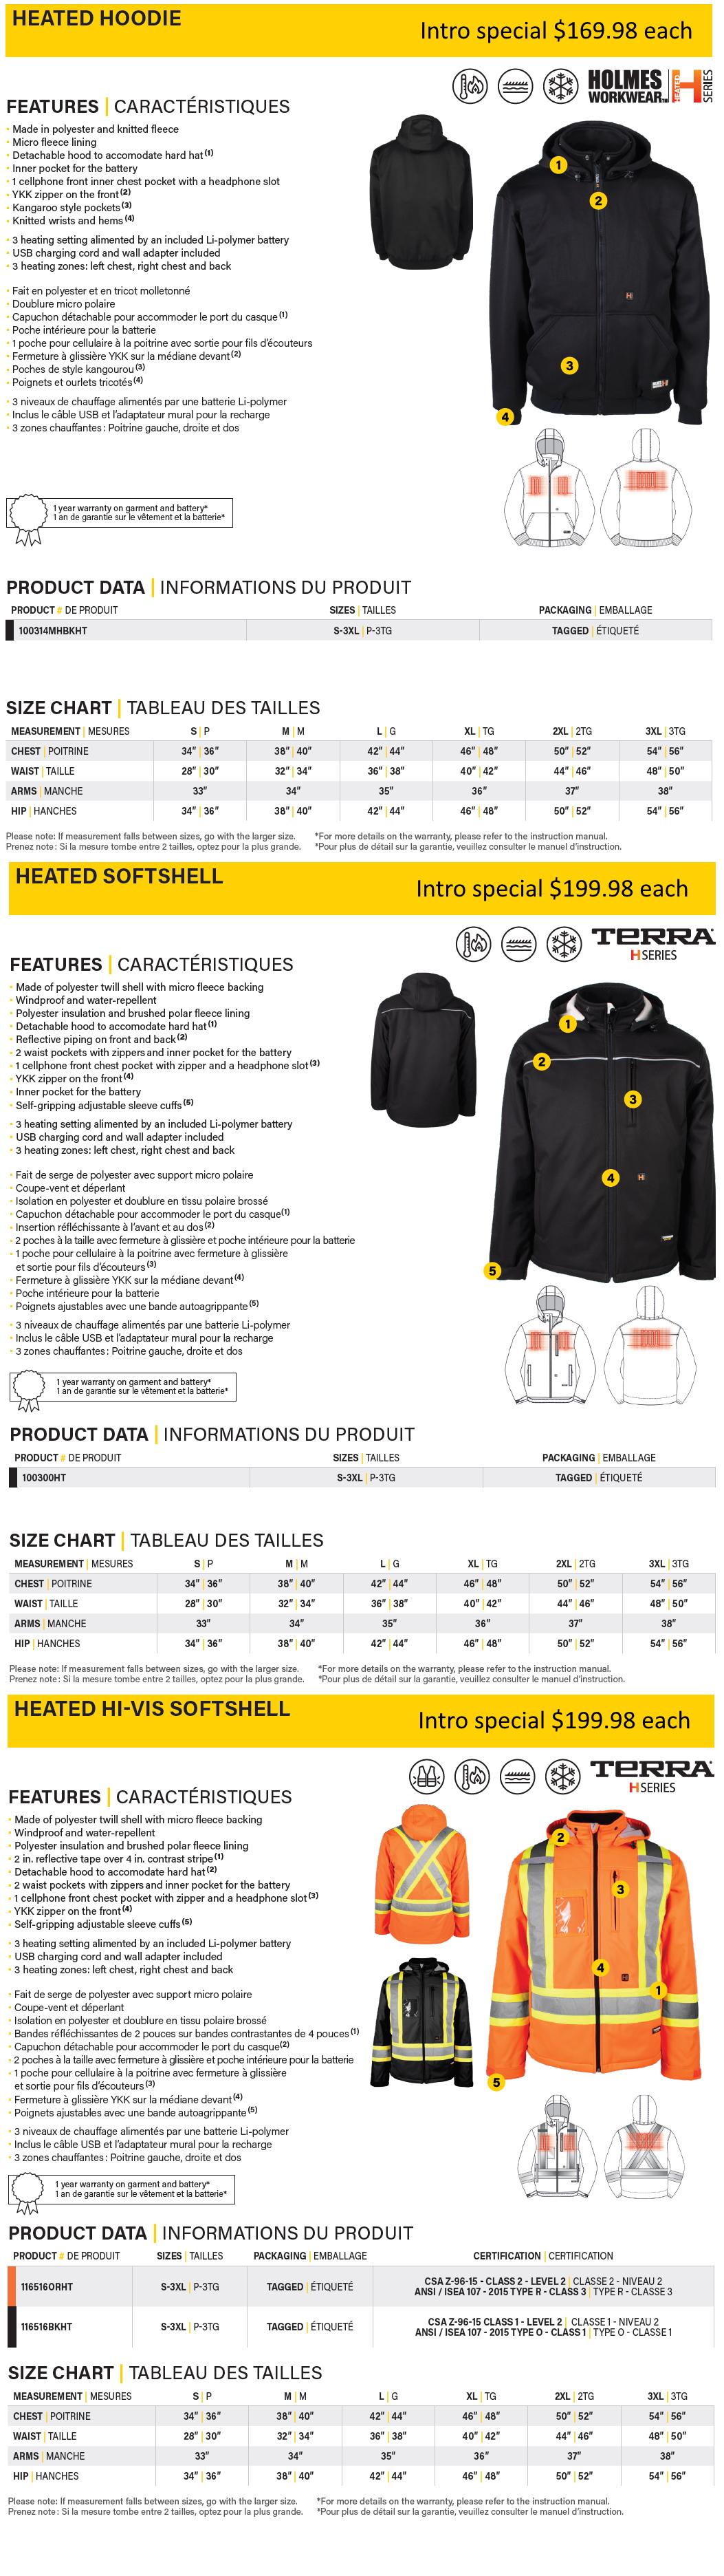 Heated Jacket from ABADOO Promo Regina Promo products